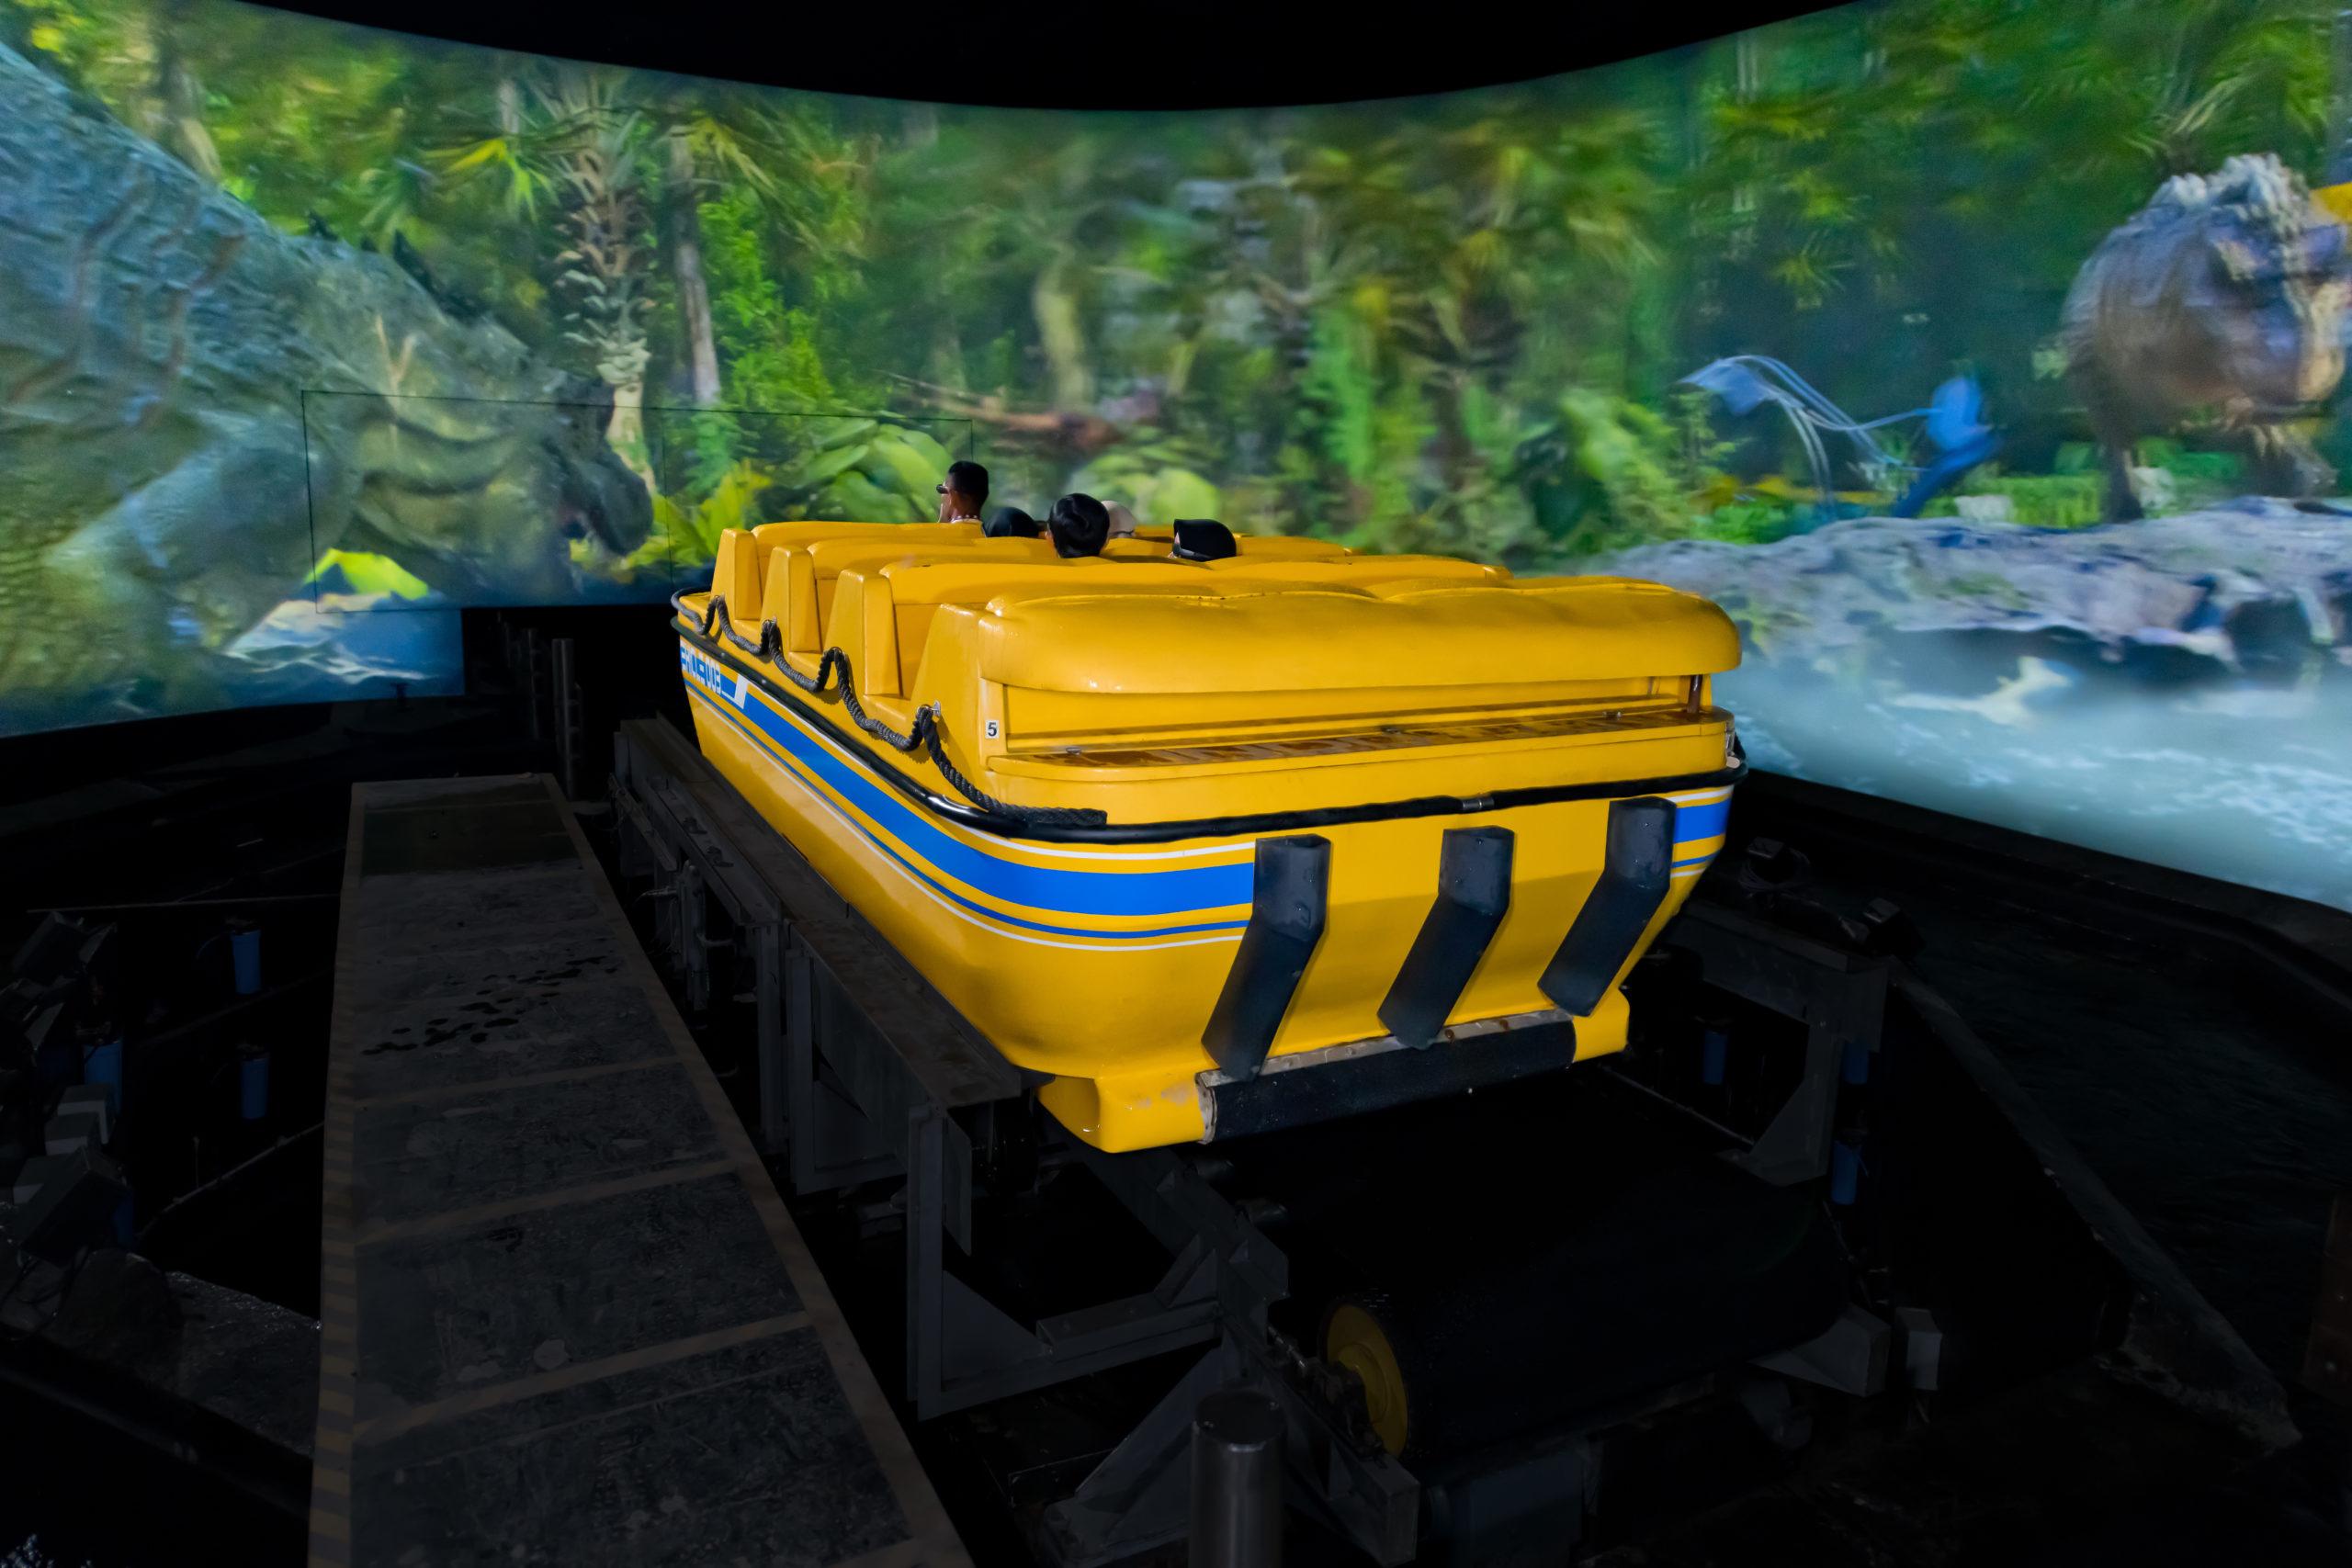 Interlink New Ride : Immersive Superflume Jurassic Island at Trans Studio Cibubur